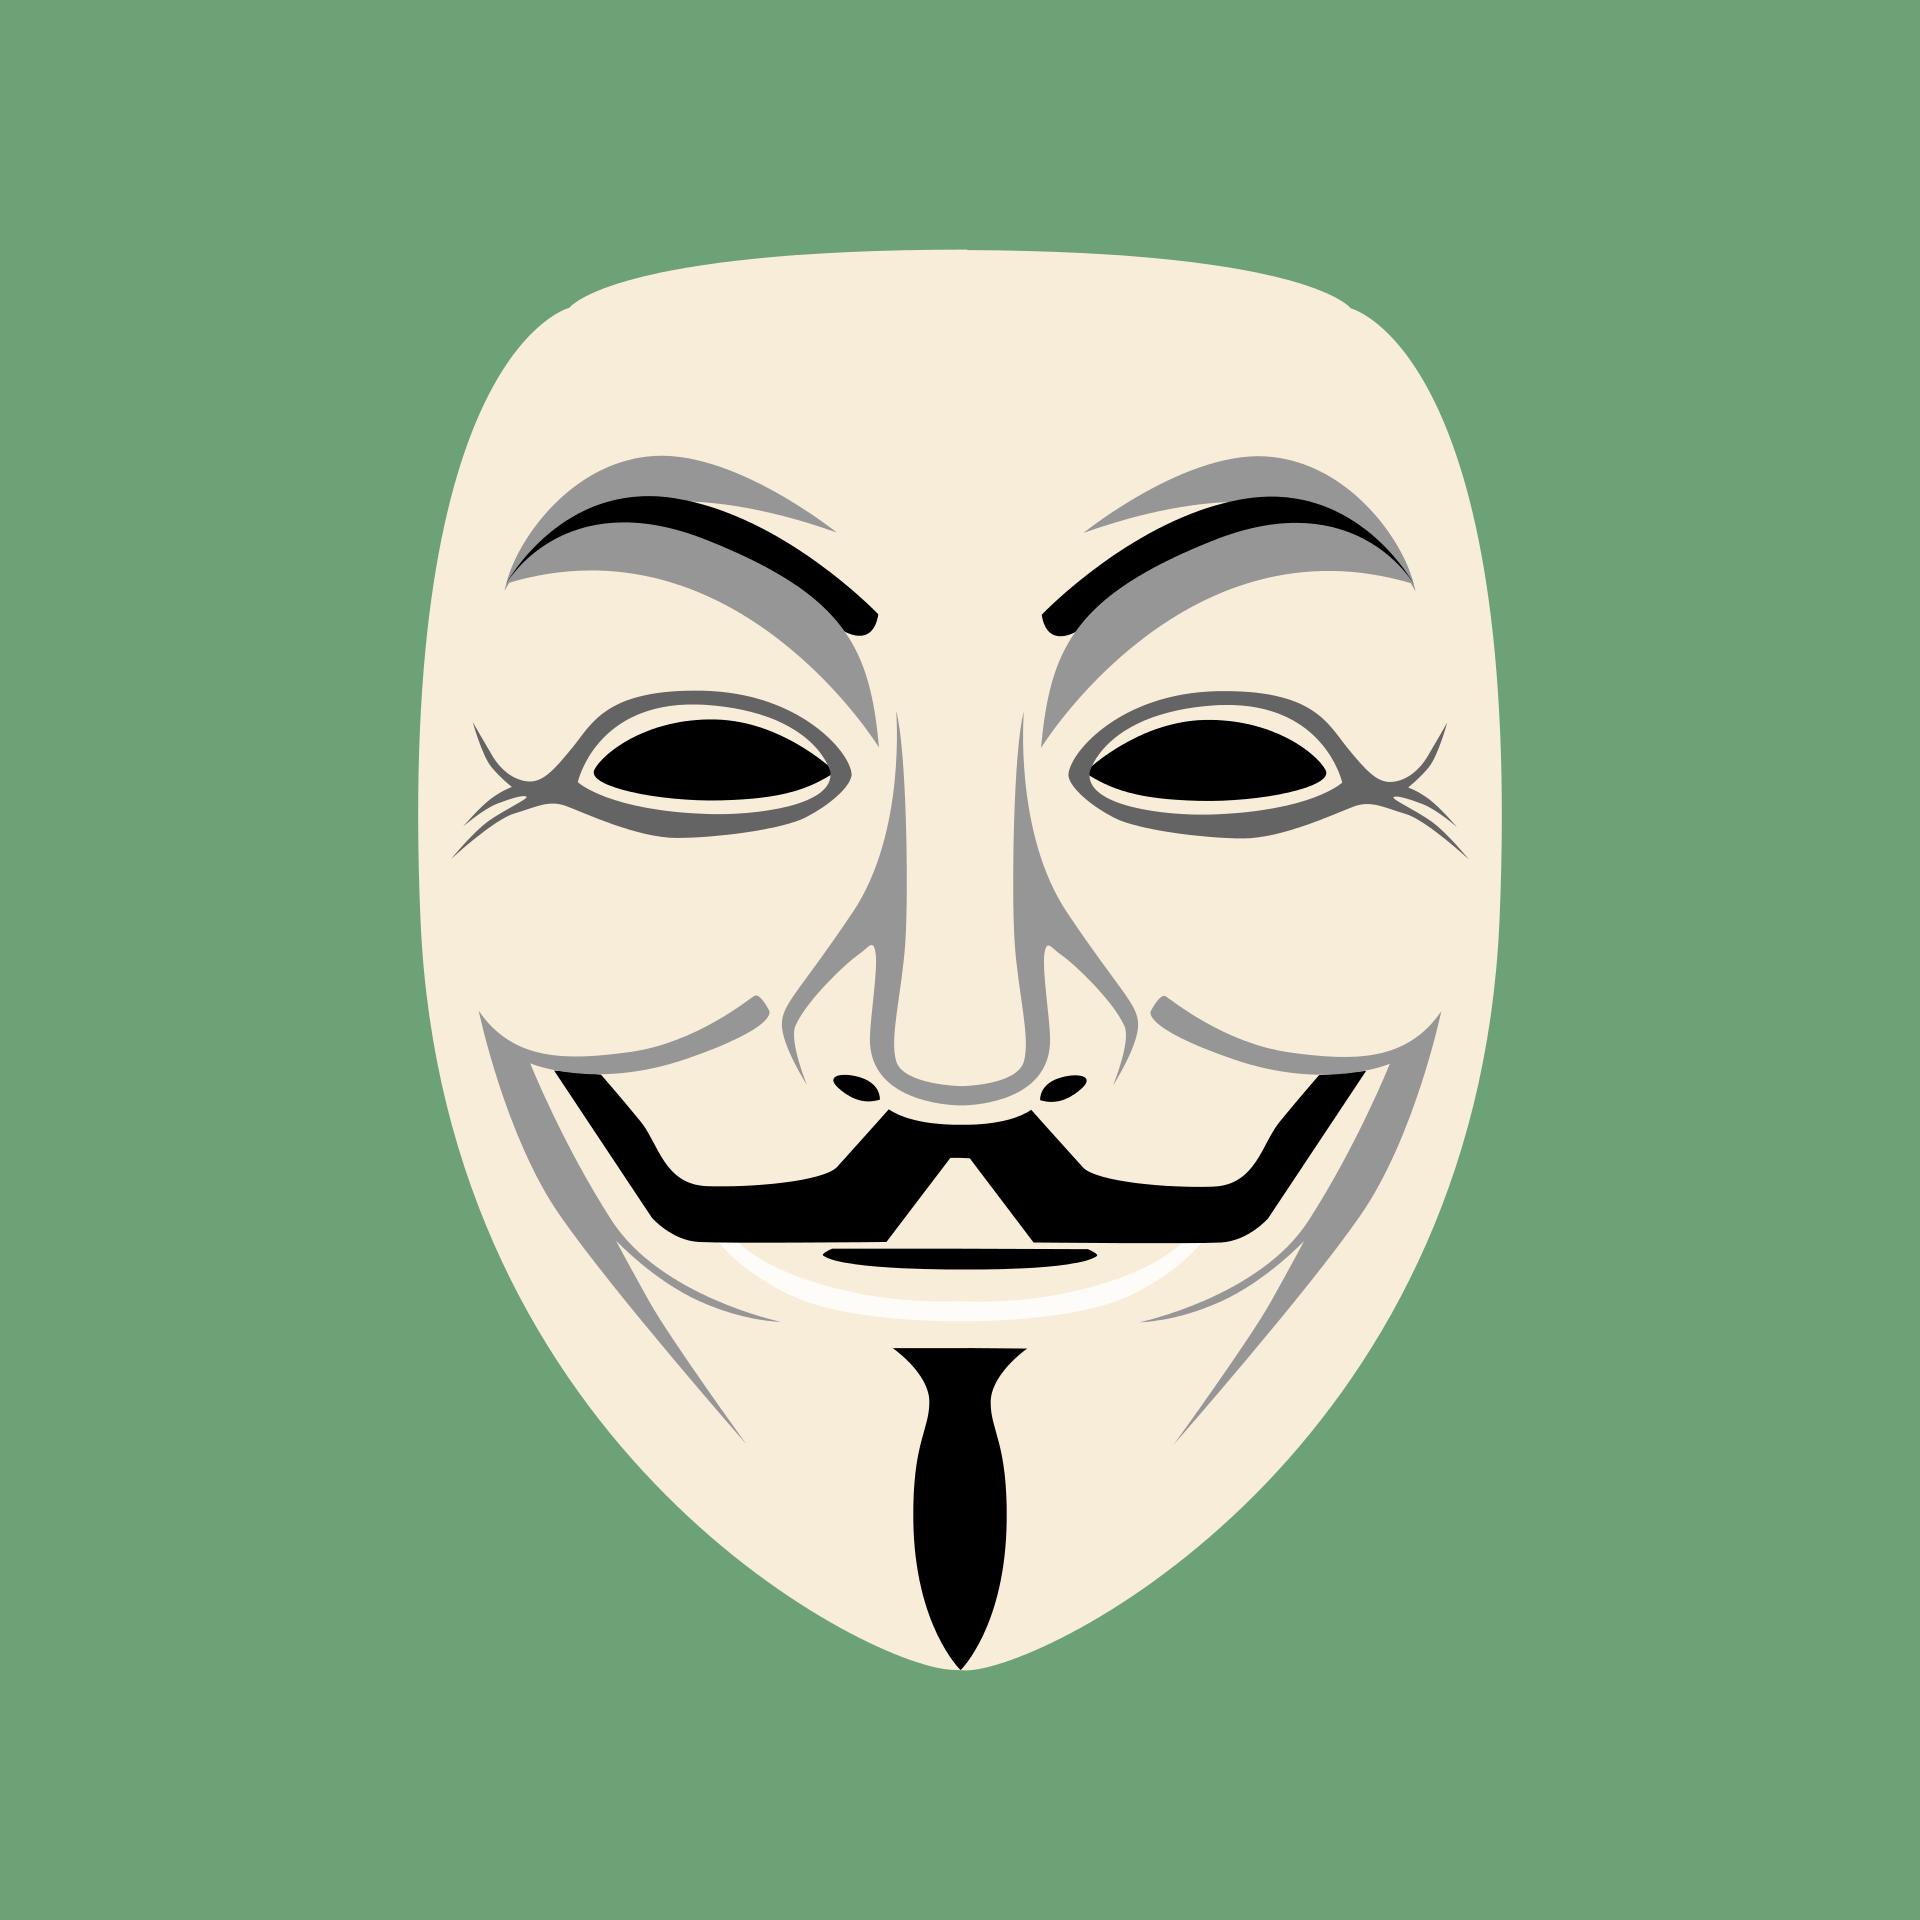 mask-1587566